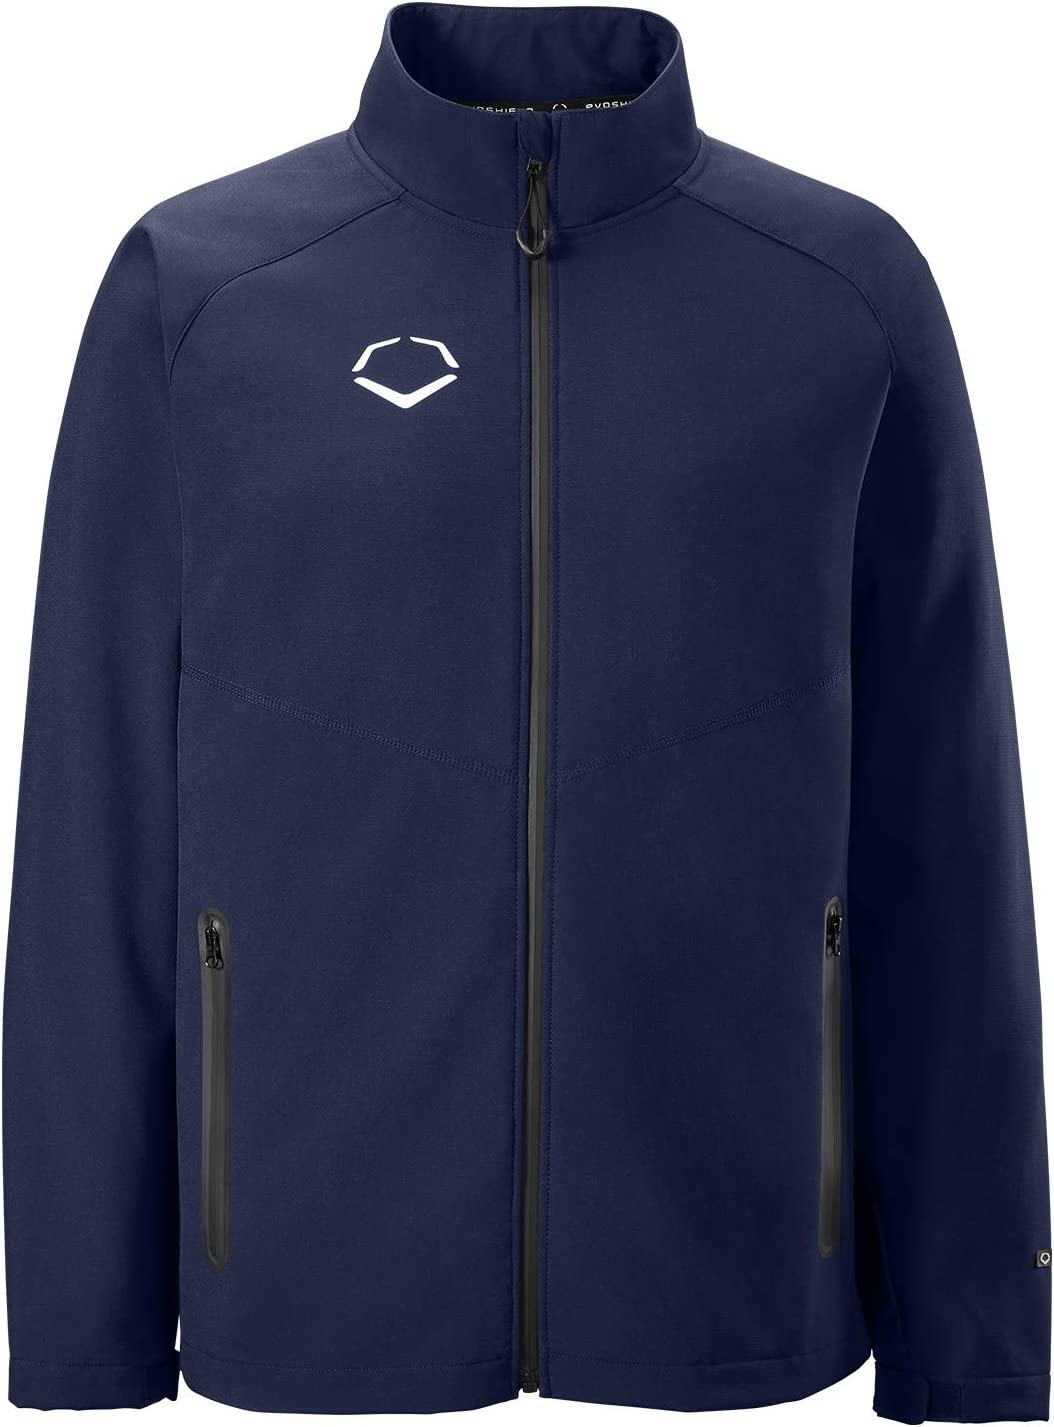 EvoShield Pro Team Stadium Jacket